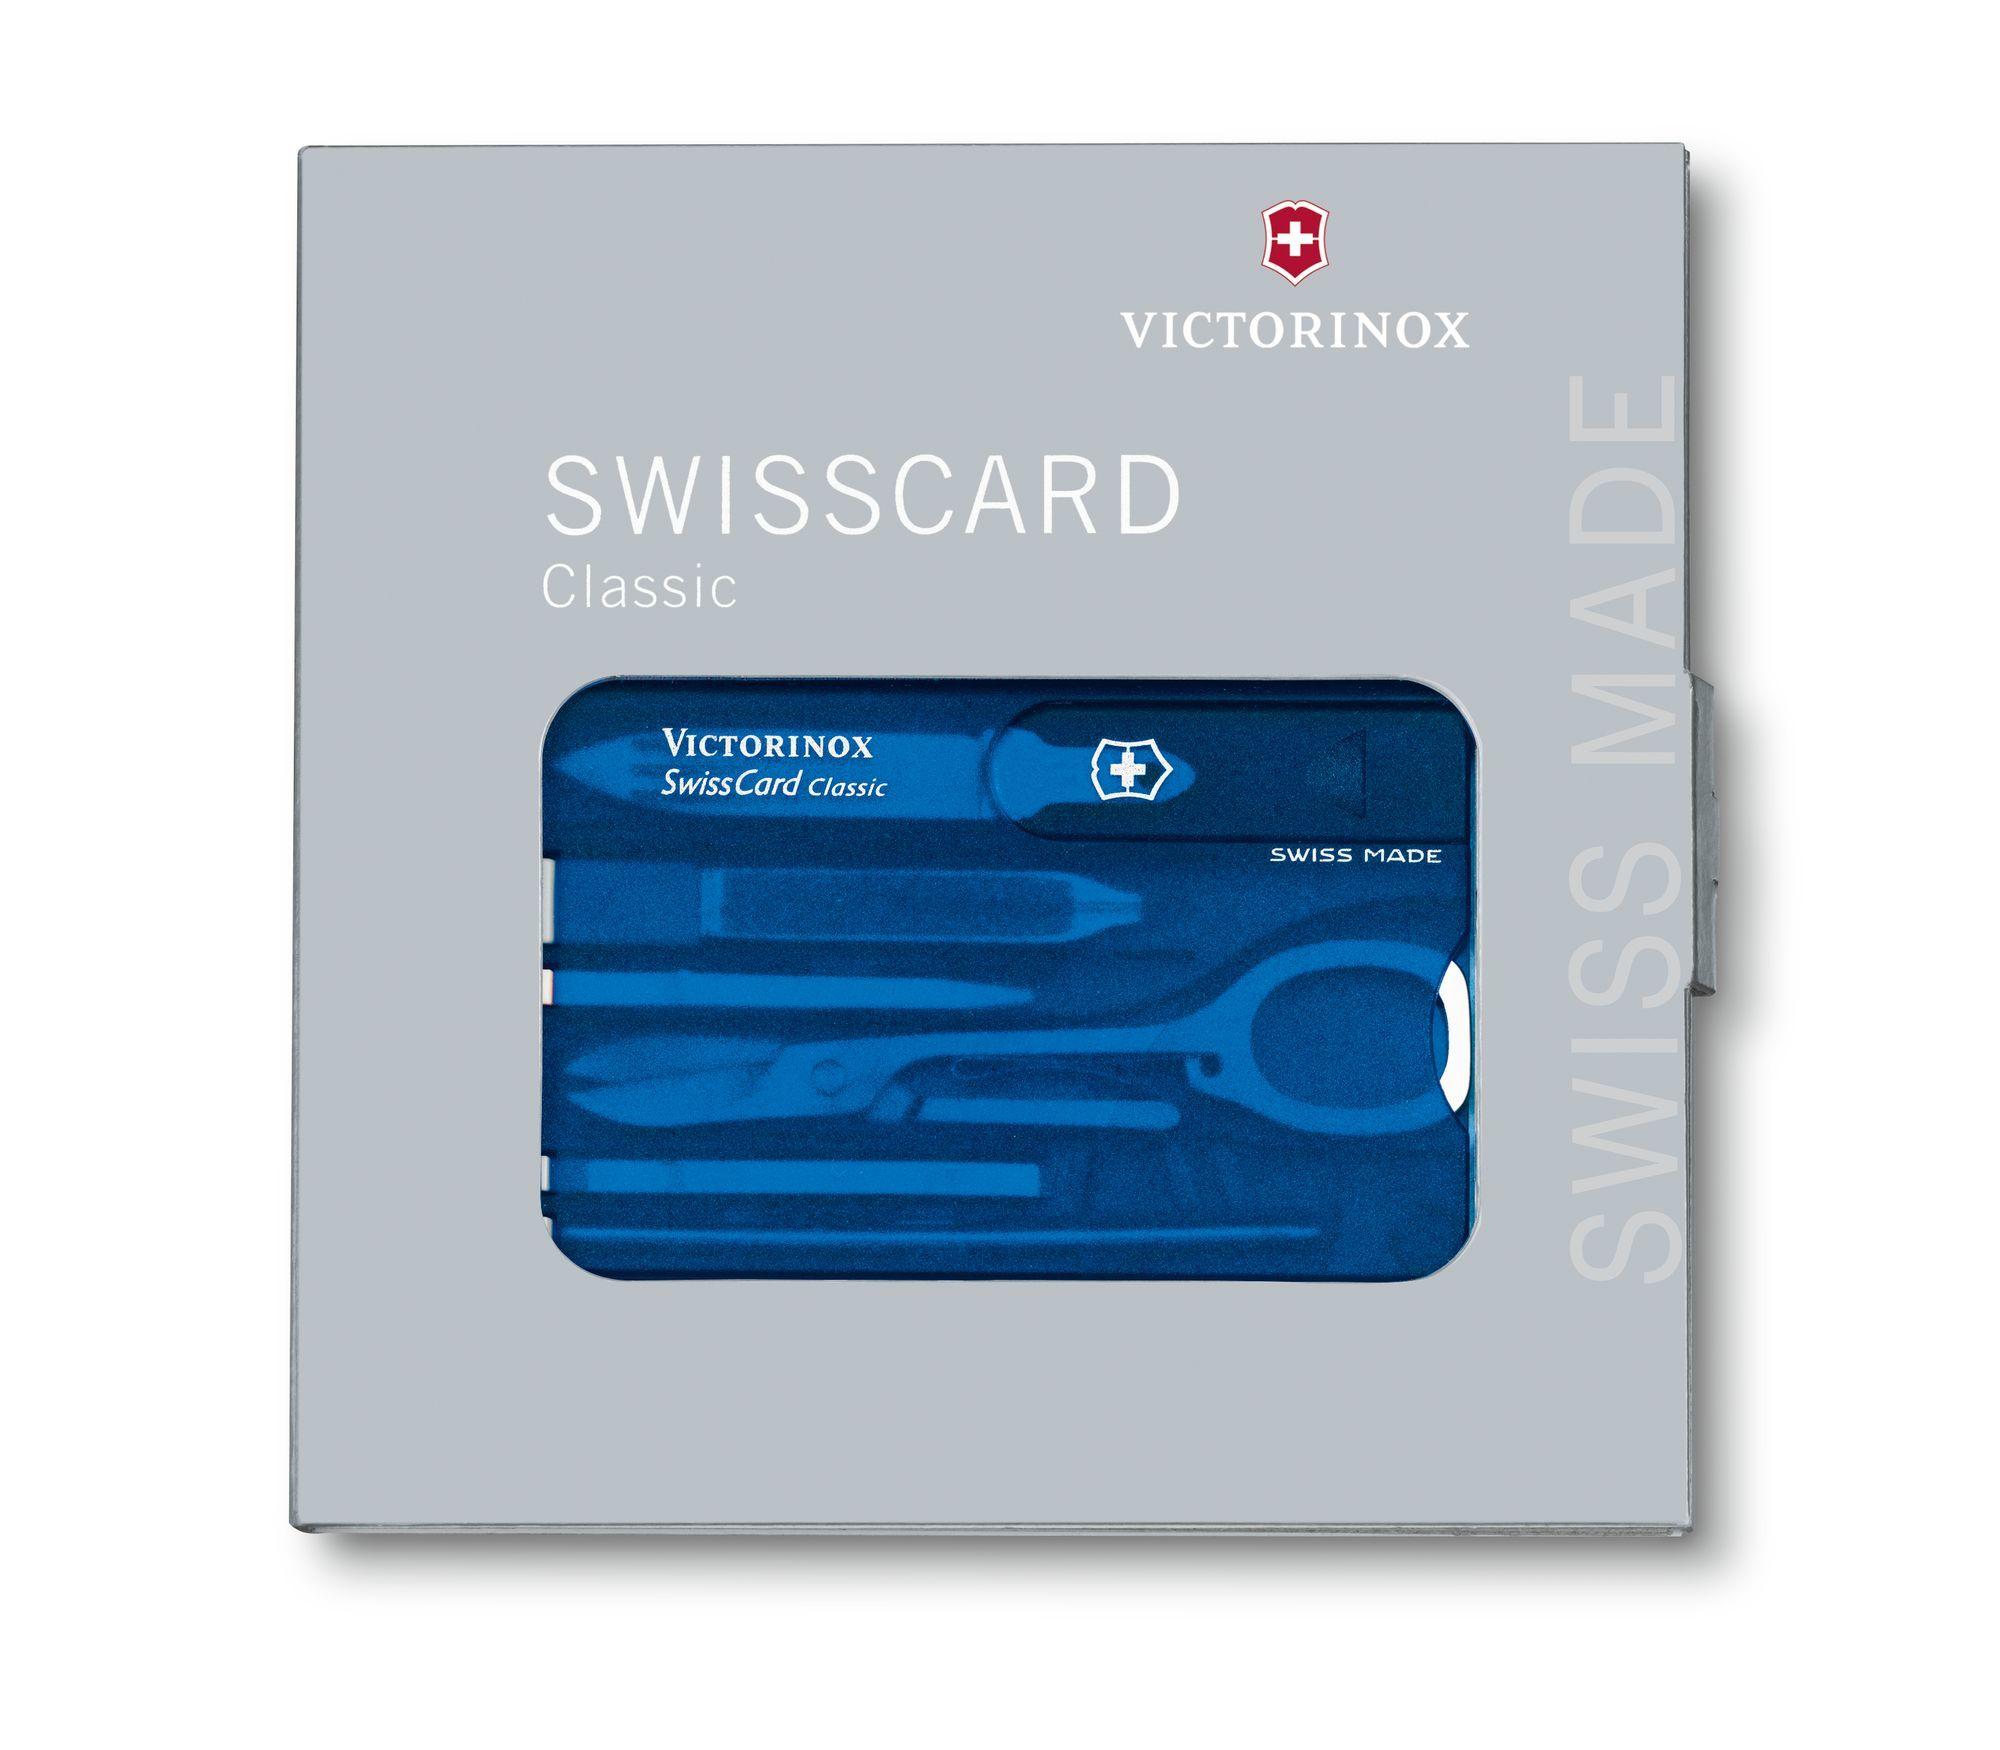 Швейцарская карта Victorinox SwissCard Classic Blue (0.7122.T2) синяя полупрозрачная - Wenger-Victorinox.Ru